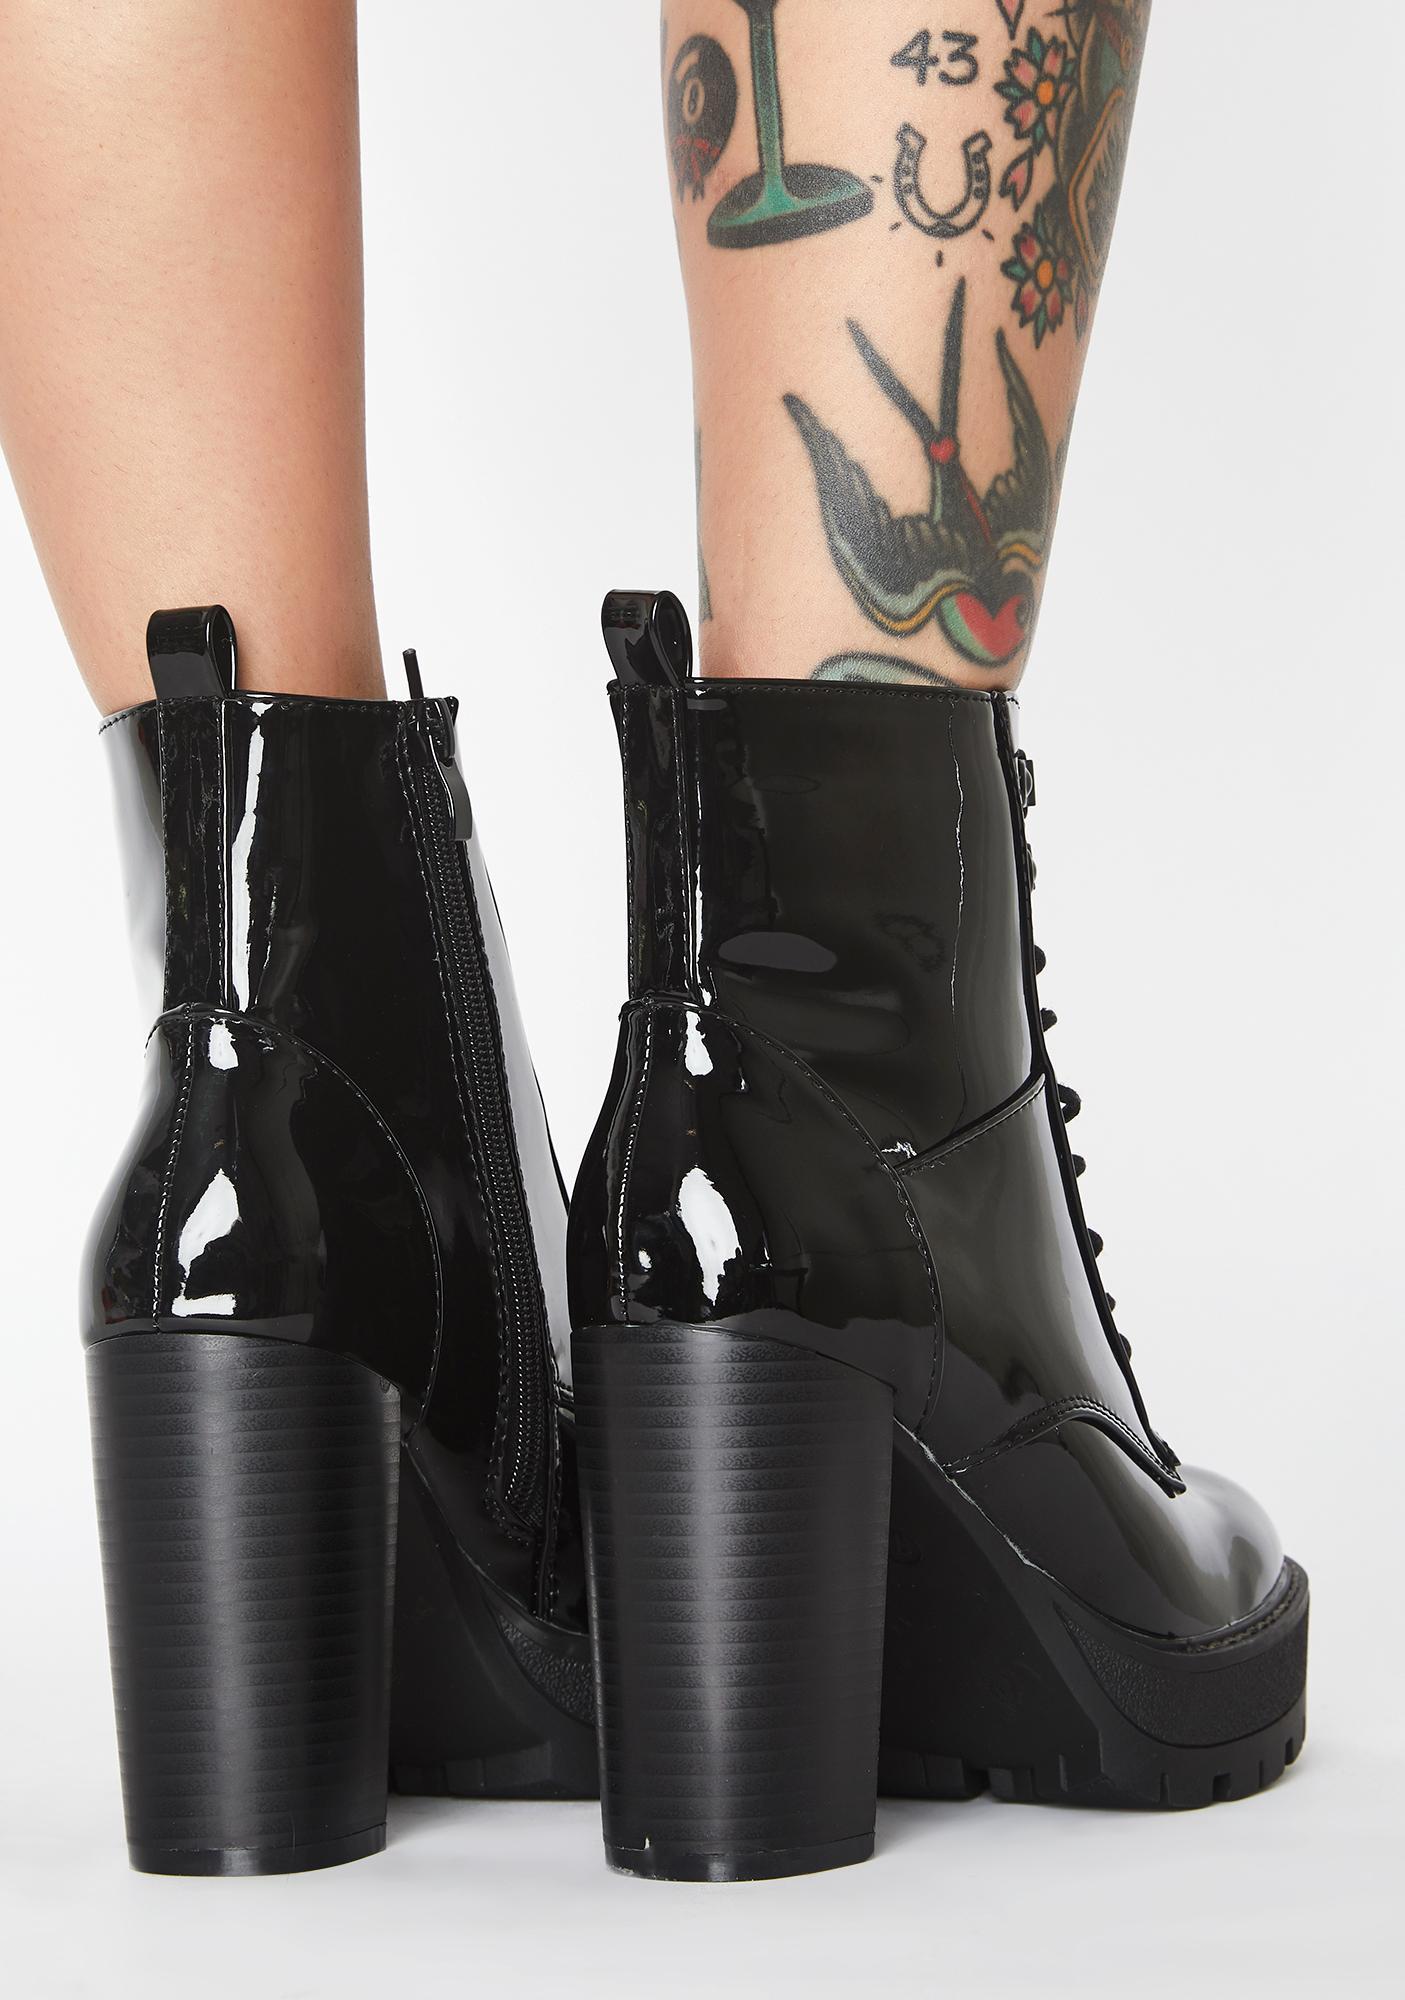 AZALEA WANG Asha Patent Boots